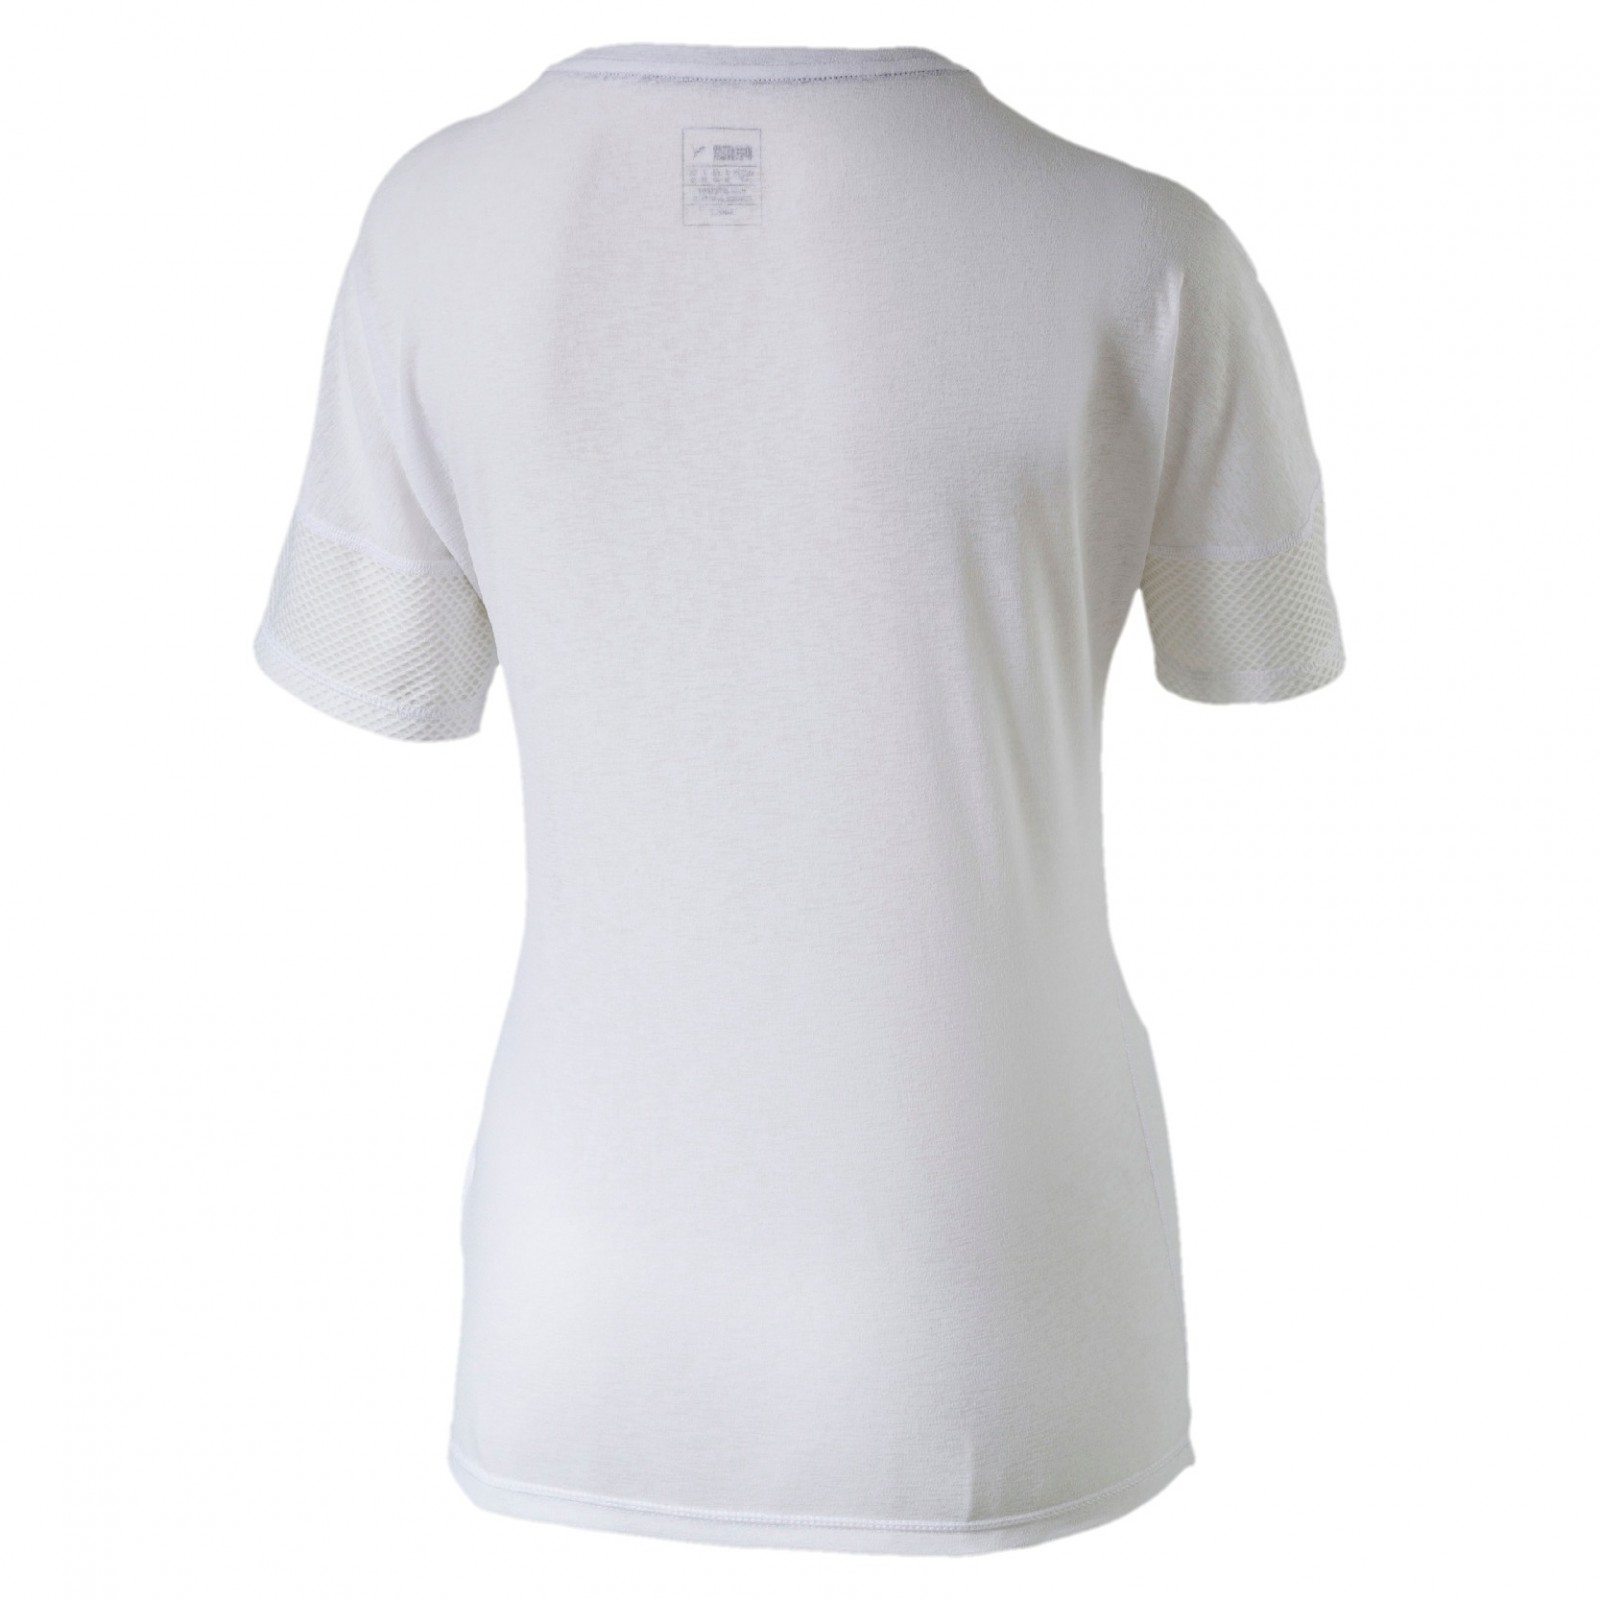 2b7931305c0 Dámské Tričko Puma Loose Tee White